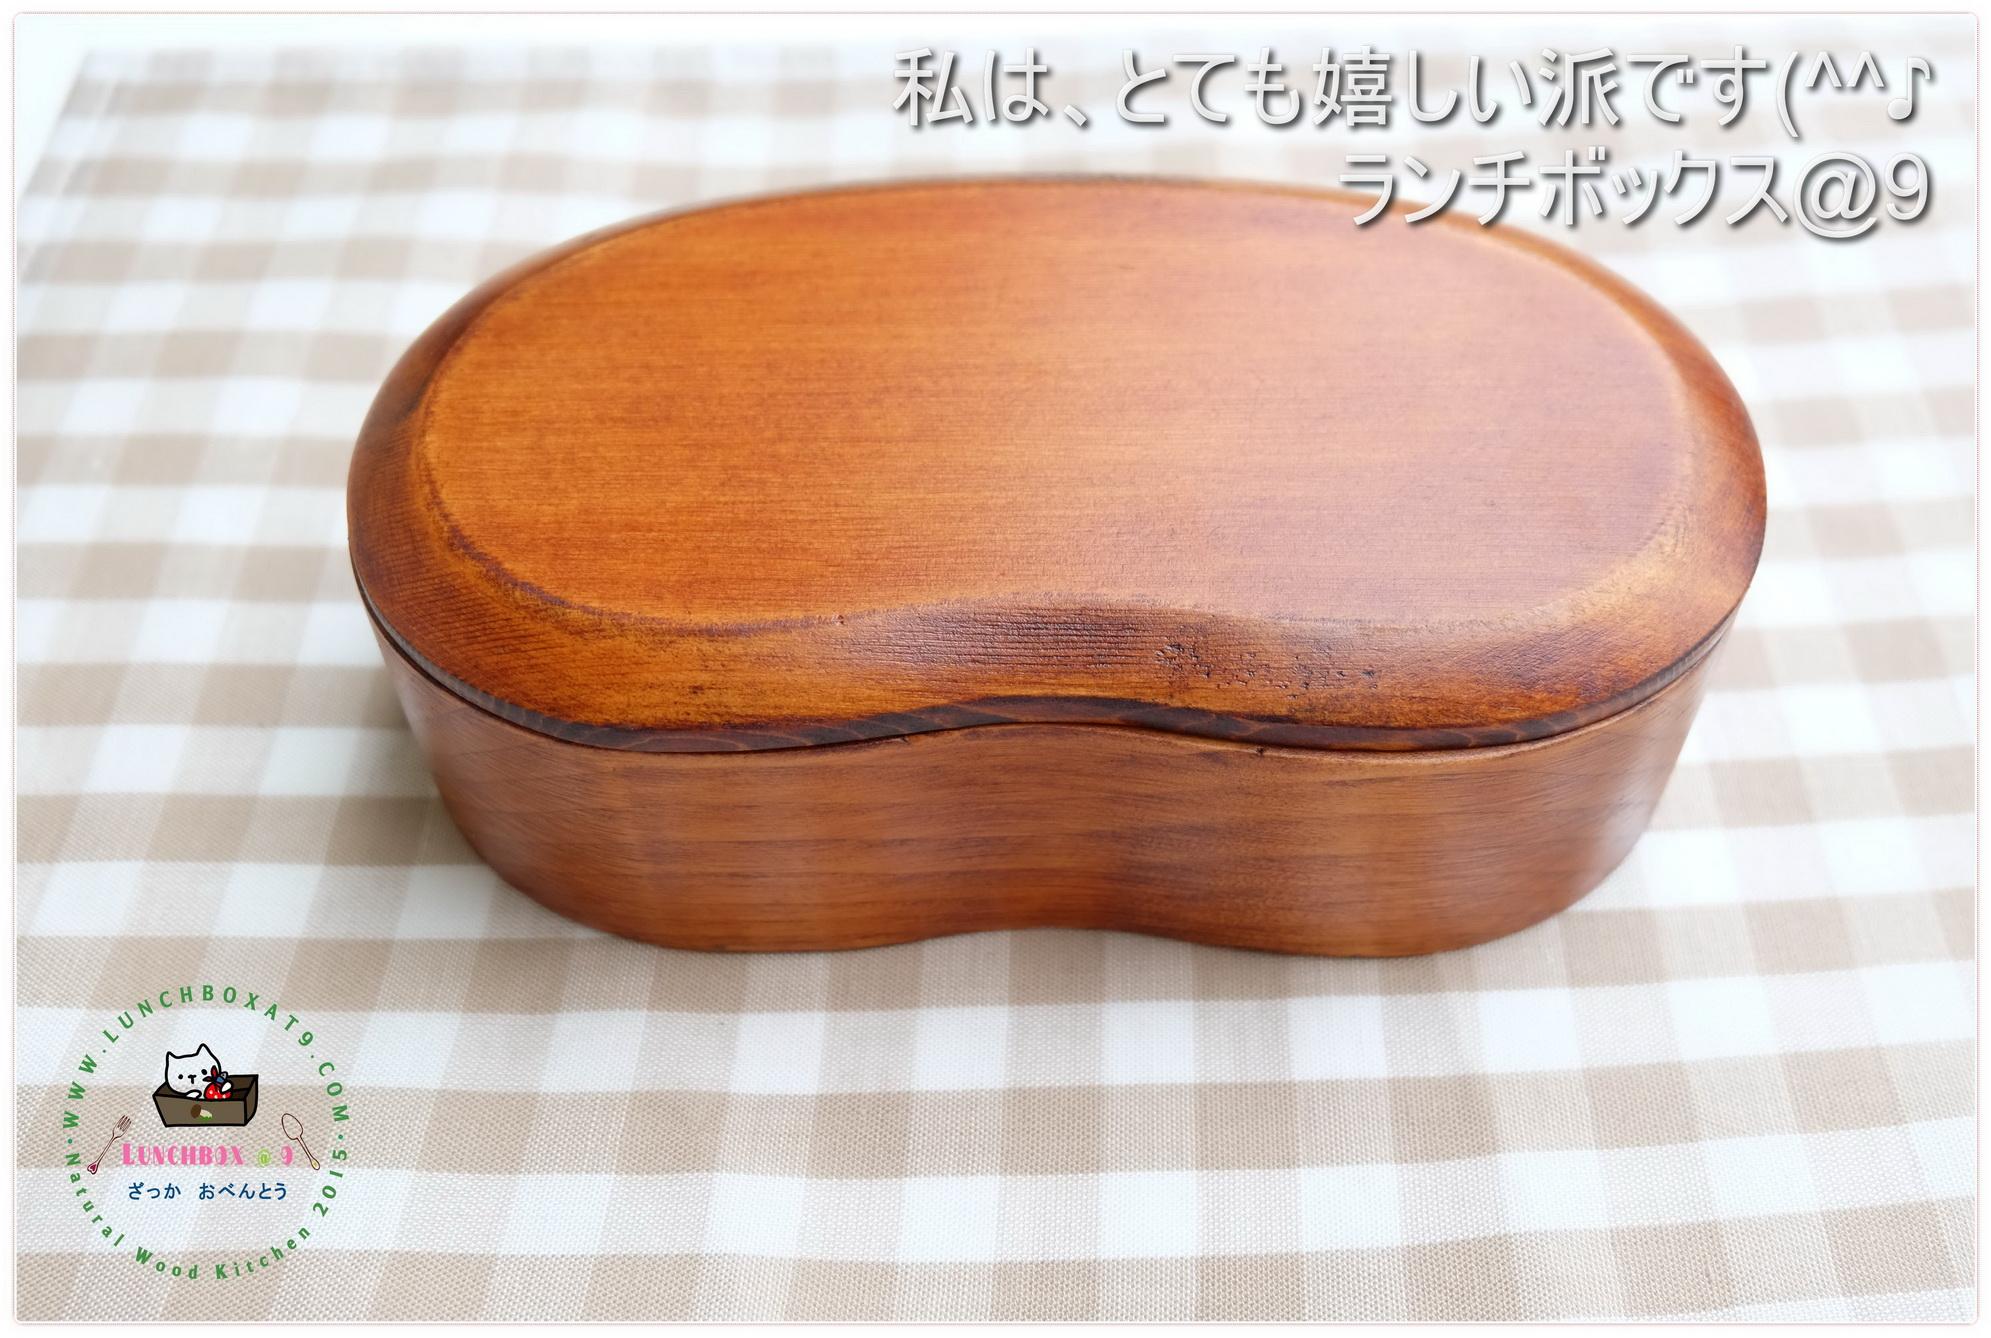 Soramame Lacquered Hemlock Bento Boxกล่องข้าวญี่ปุ่นทรงถั่ว สีไม้คลาสสิค 1 ชั้น